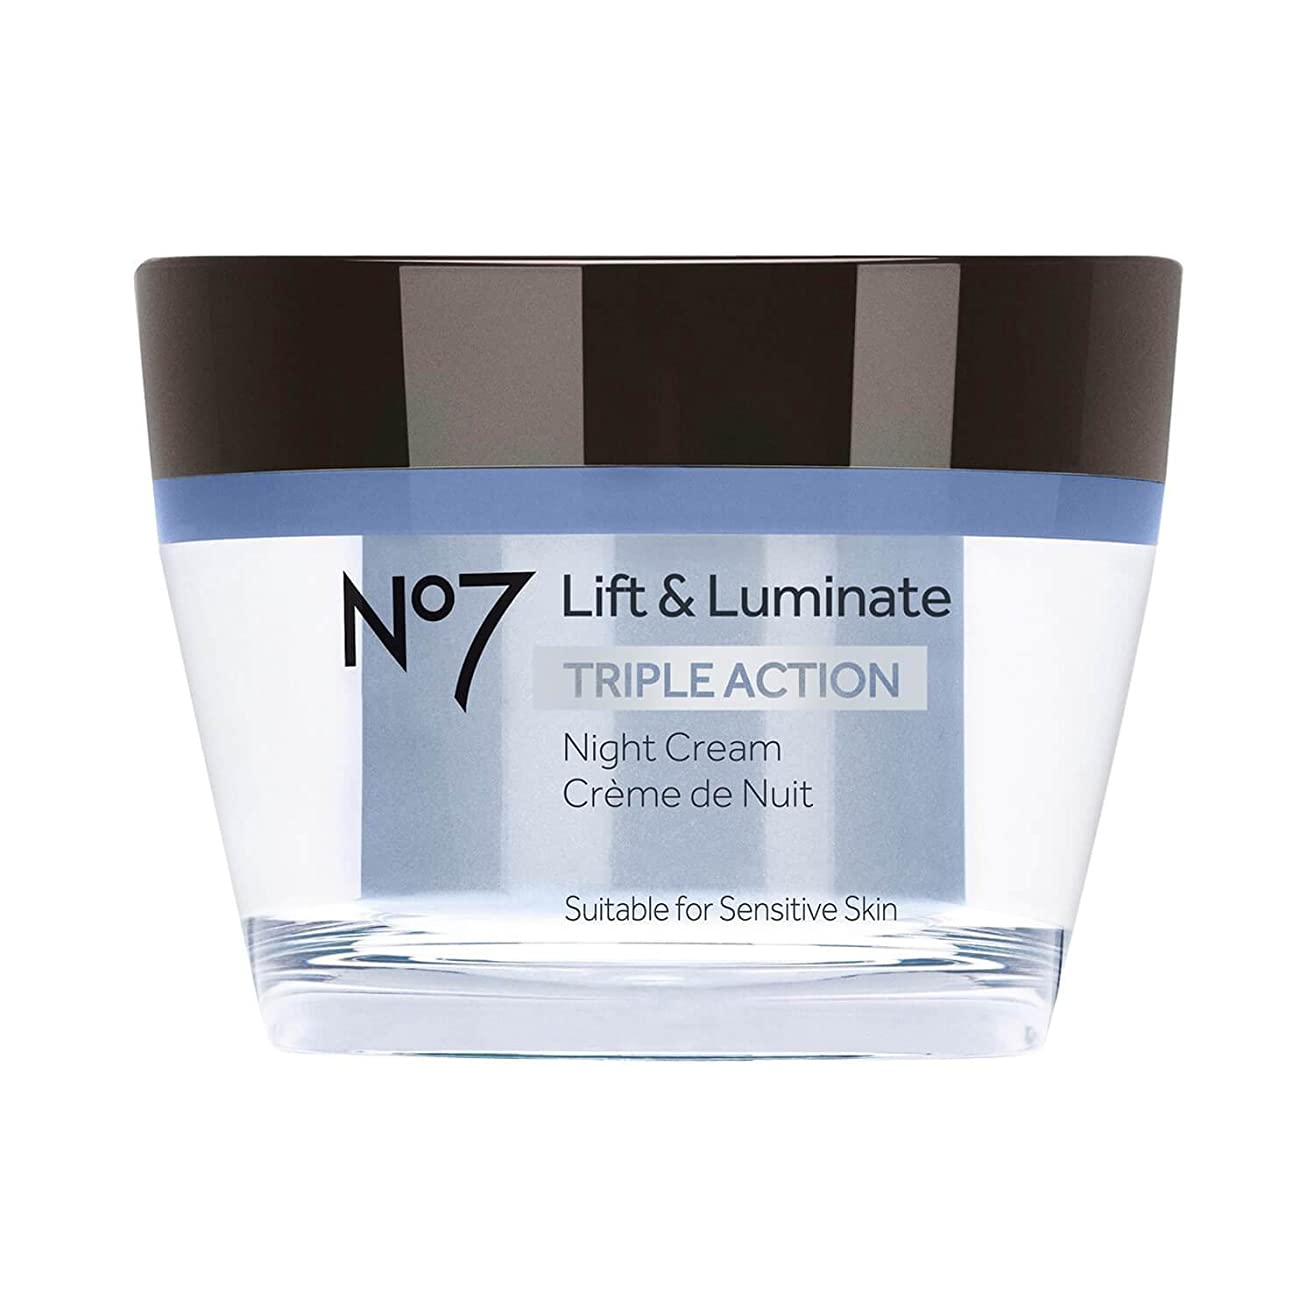 No7 Lift & Luminate Triple Action Night Cream - 1.69oz